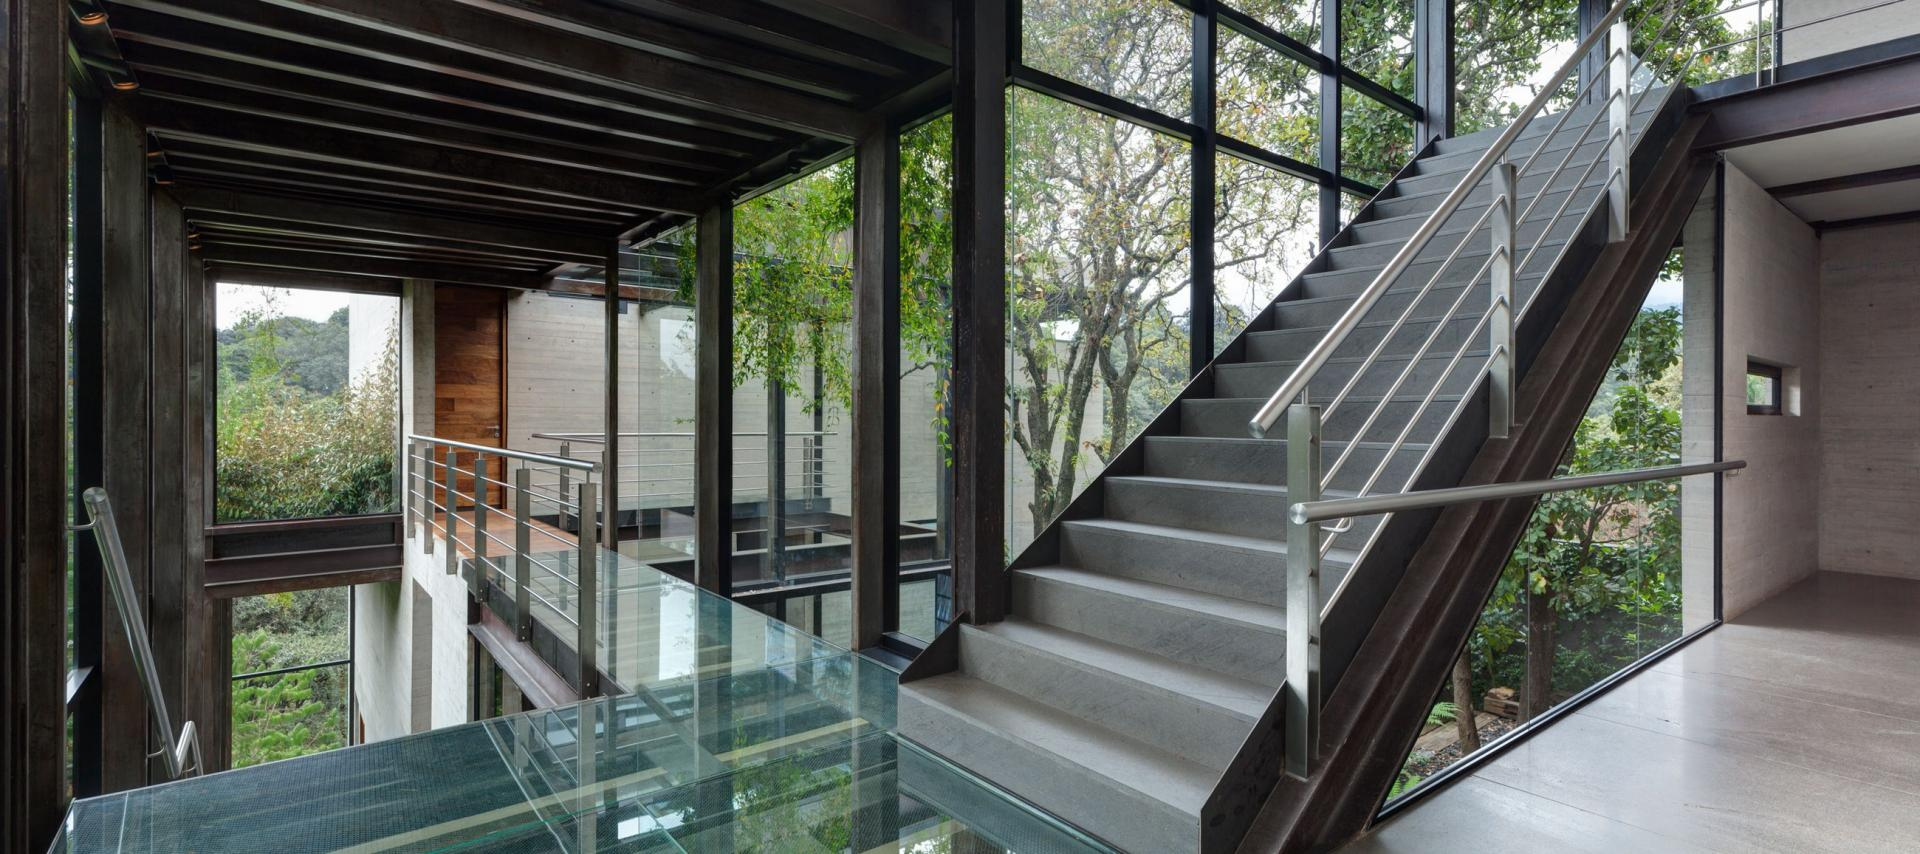 Casa Tepozcuautla - internal staircase between the levels